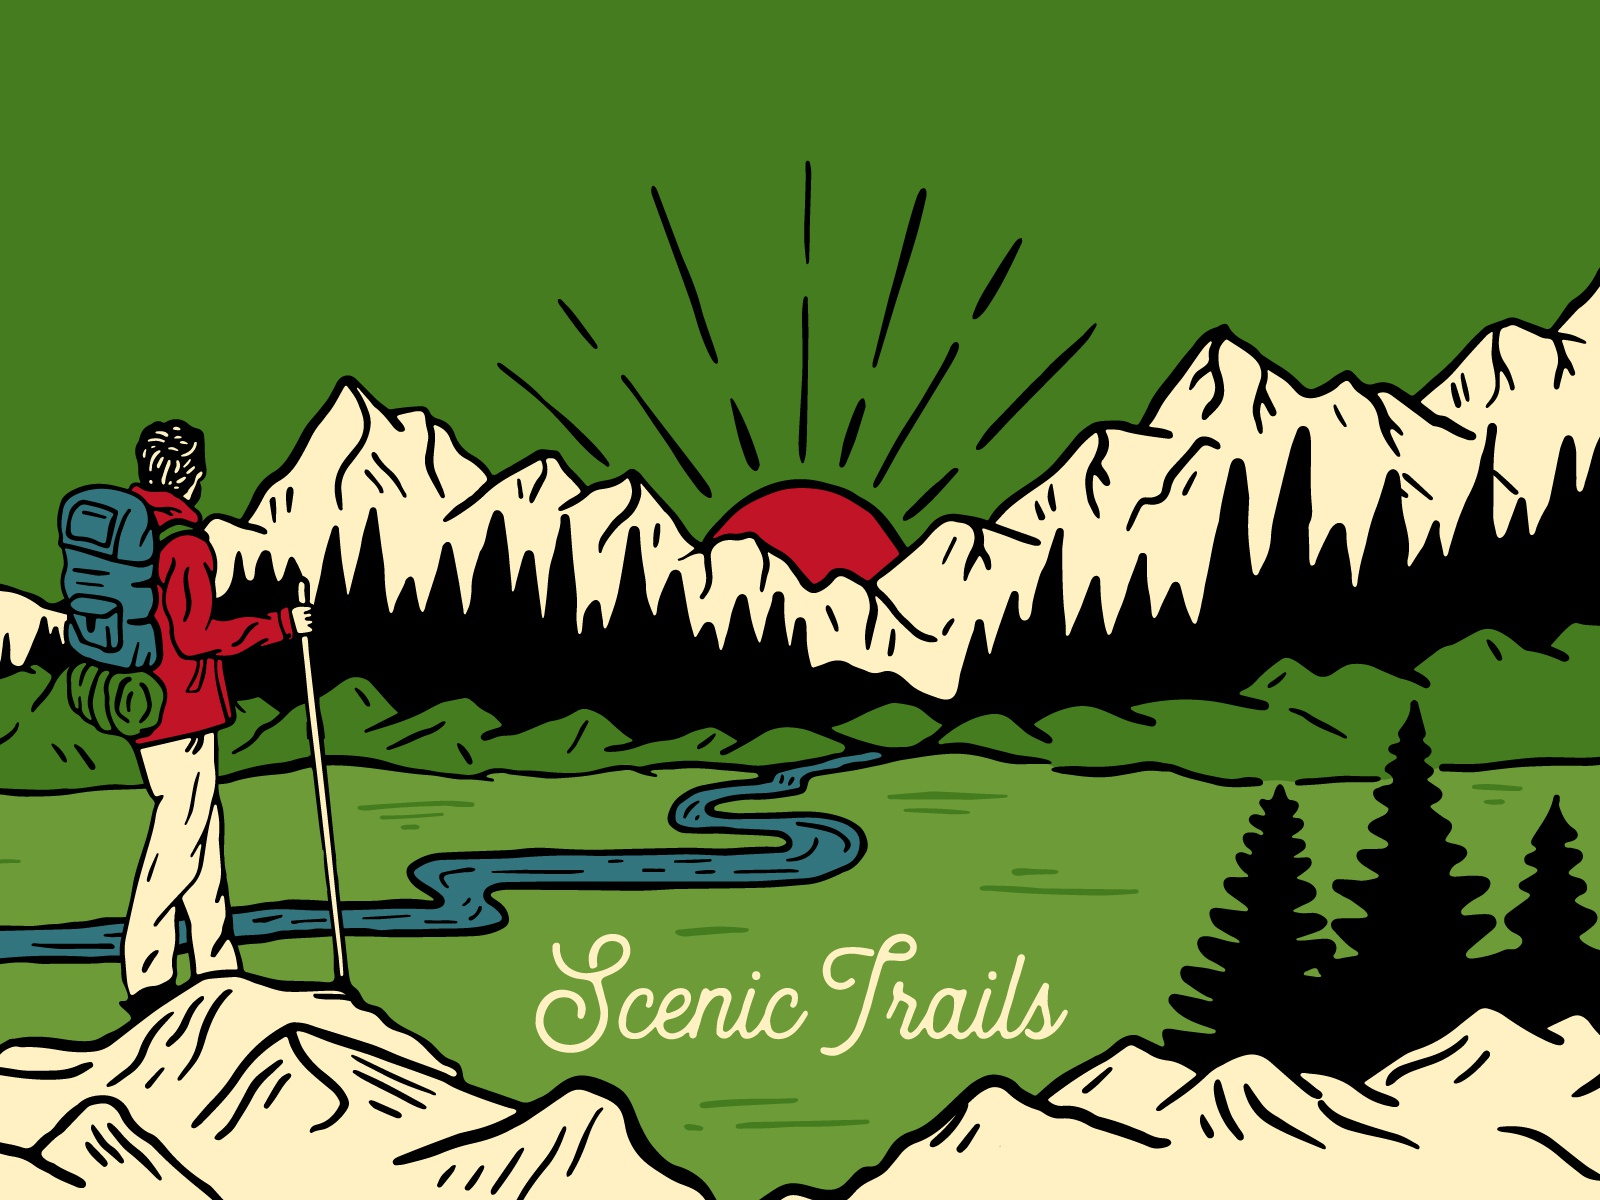 Scenic Trails mug coffee sunrise trees hand drawn mountains hiker hike